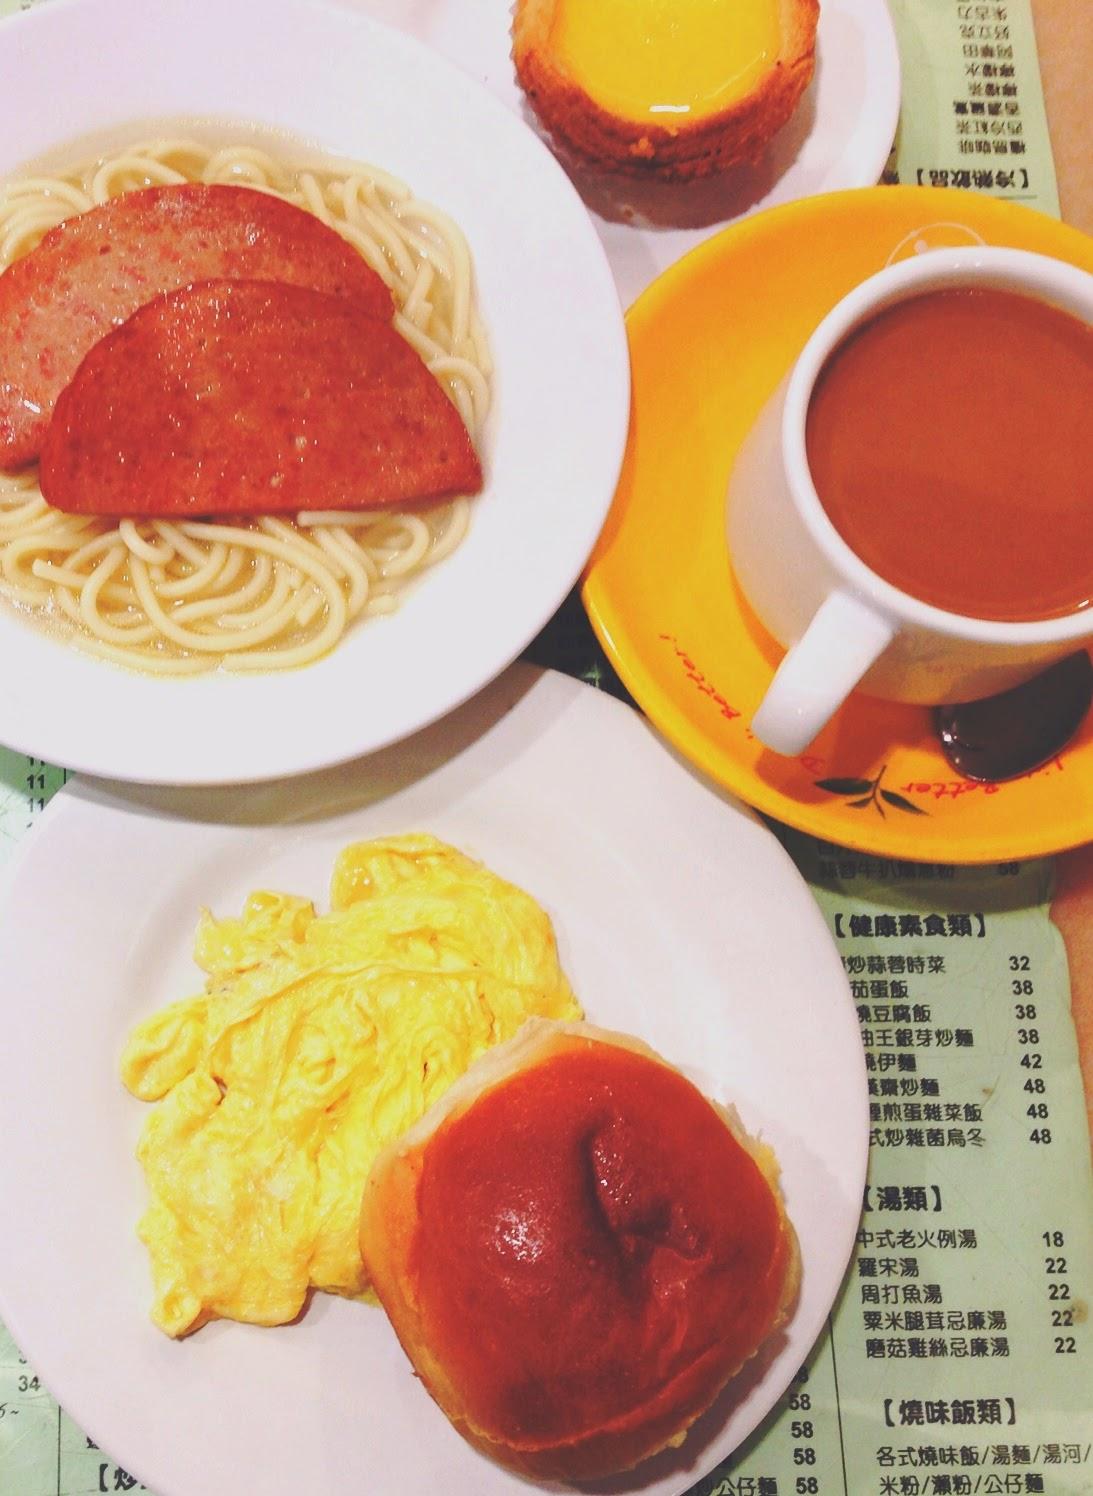 Honolulu Coffee Shop Hong Kong-style Milk Tea